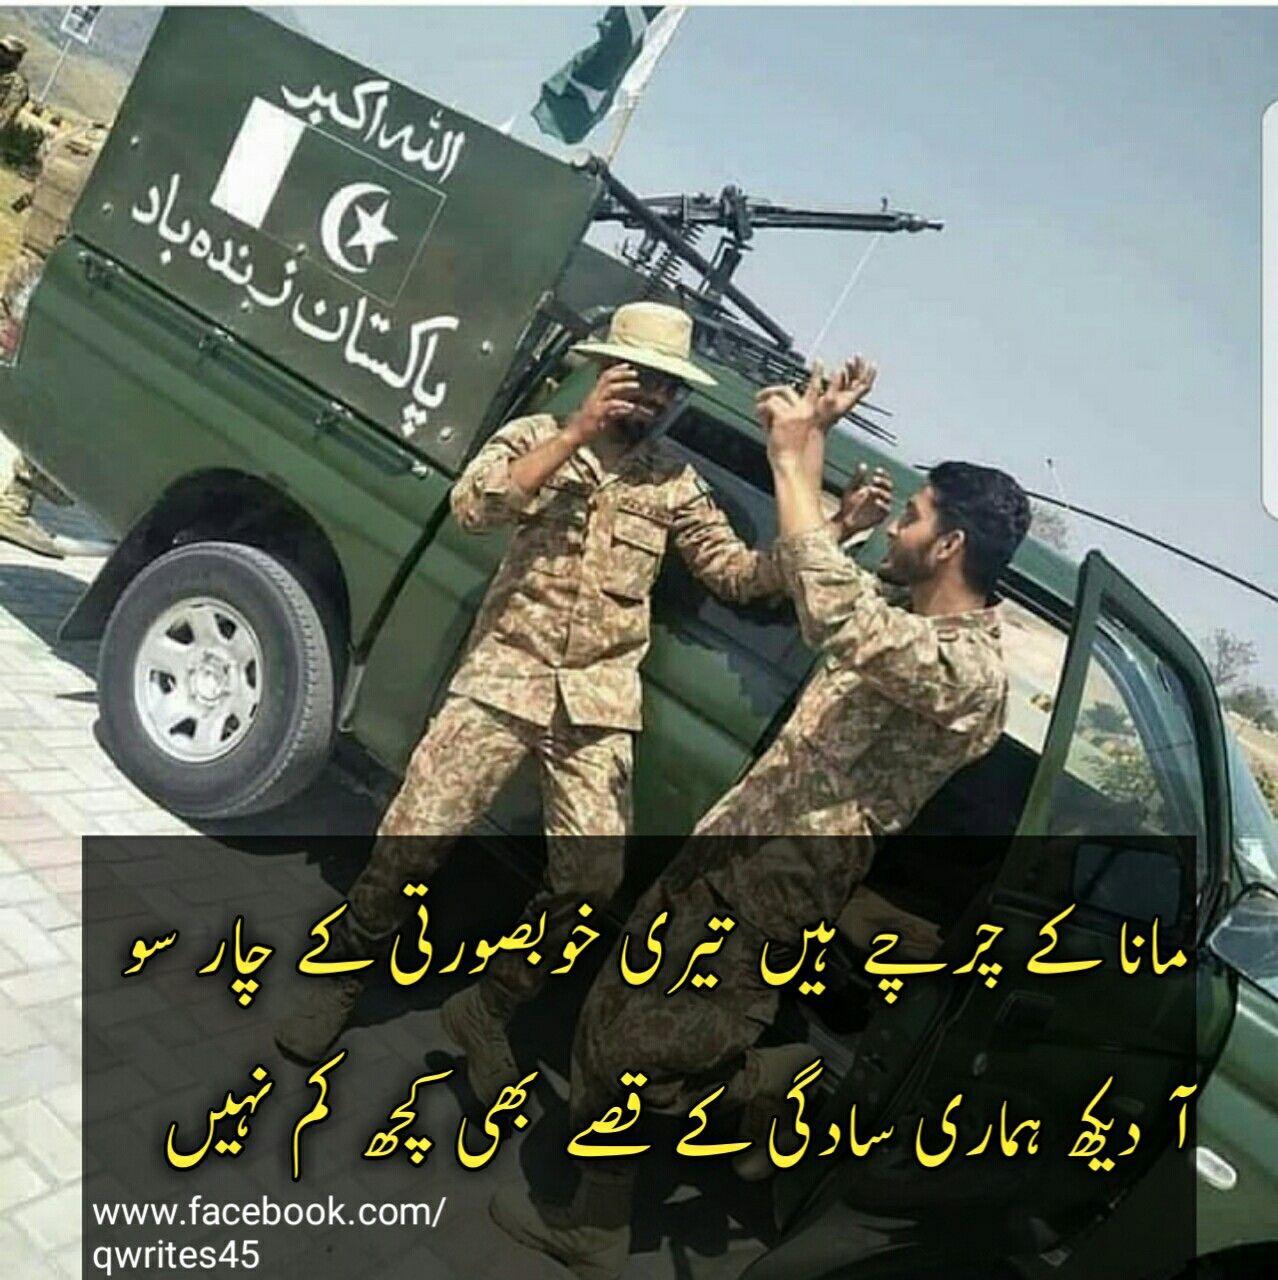 Pak Army poetry, Pak writer   Pak Army Poetry in 2019